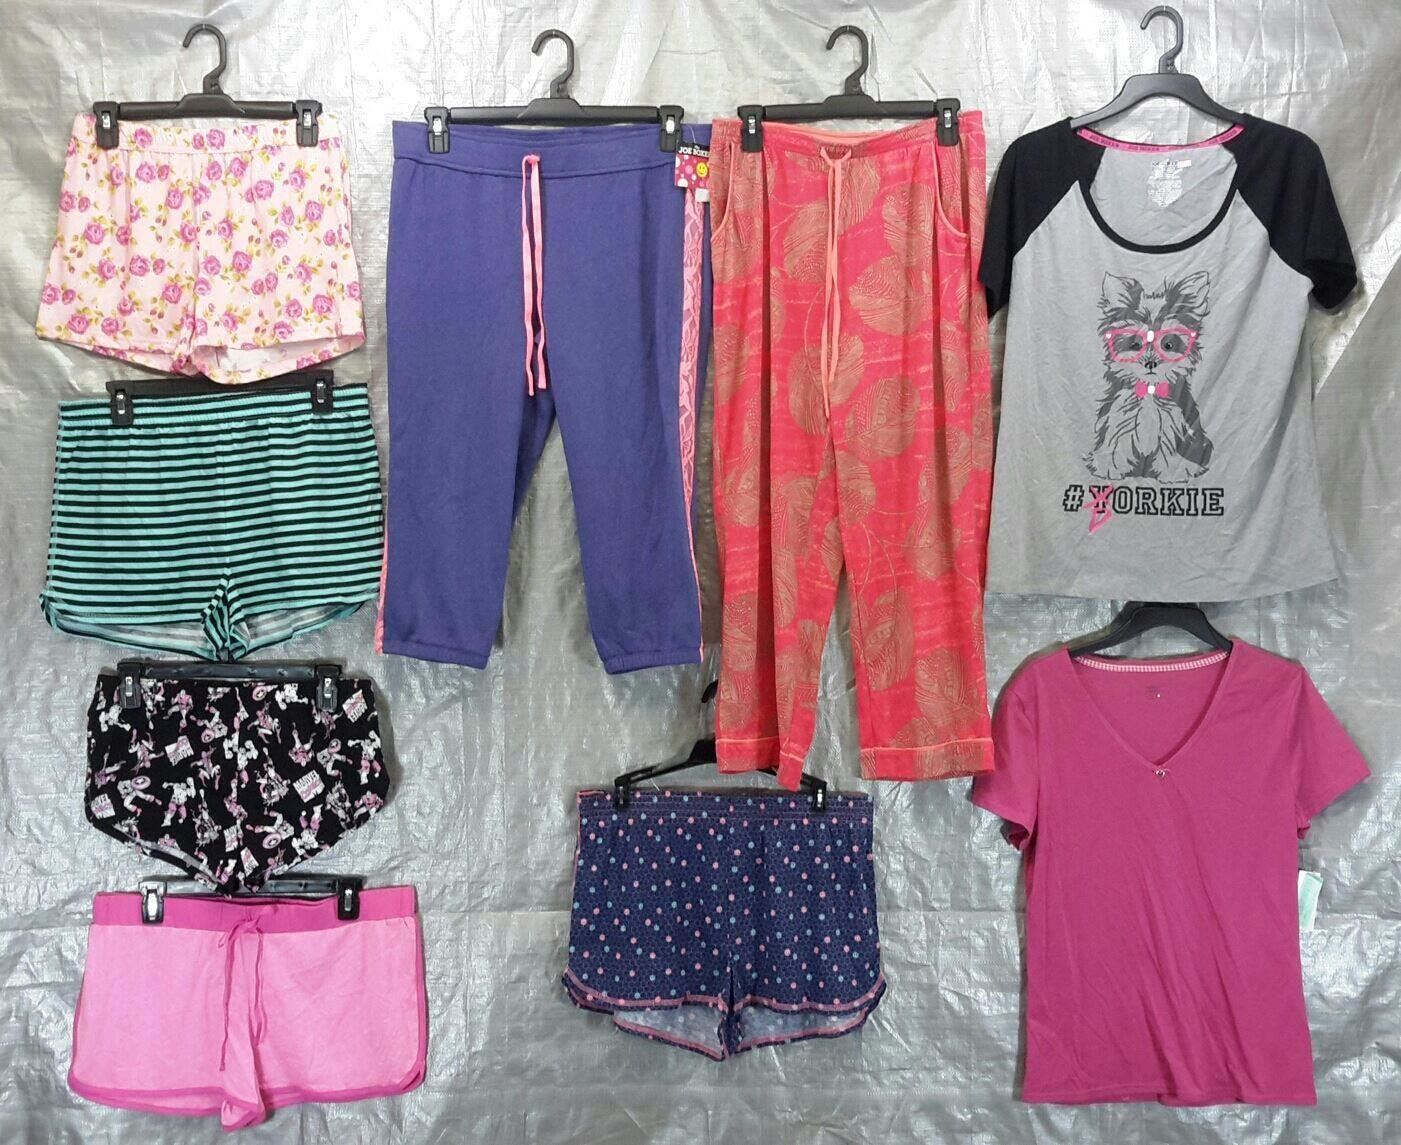 Wholesale Lot of 100 Assorted Womens Mixed Sizes Sleep Tops Bottoms PAJAMAS Sleepwear